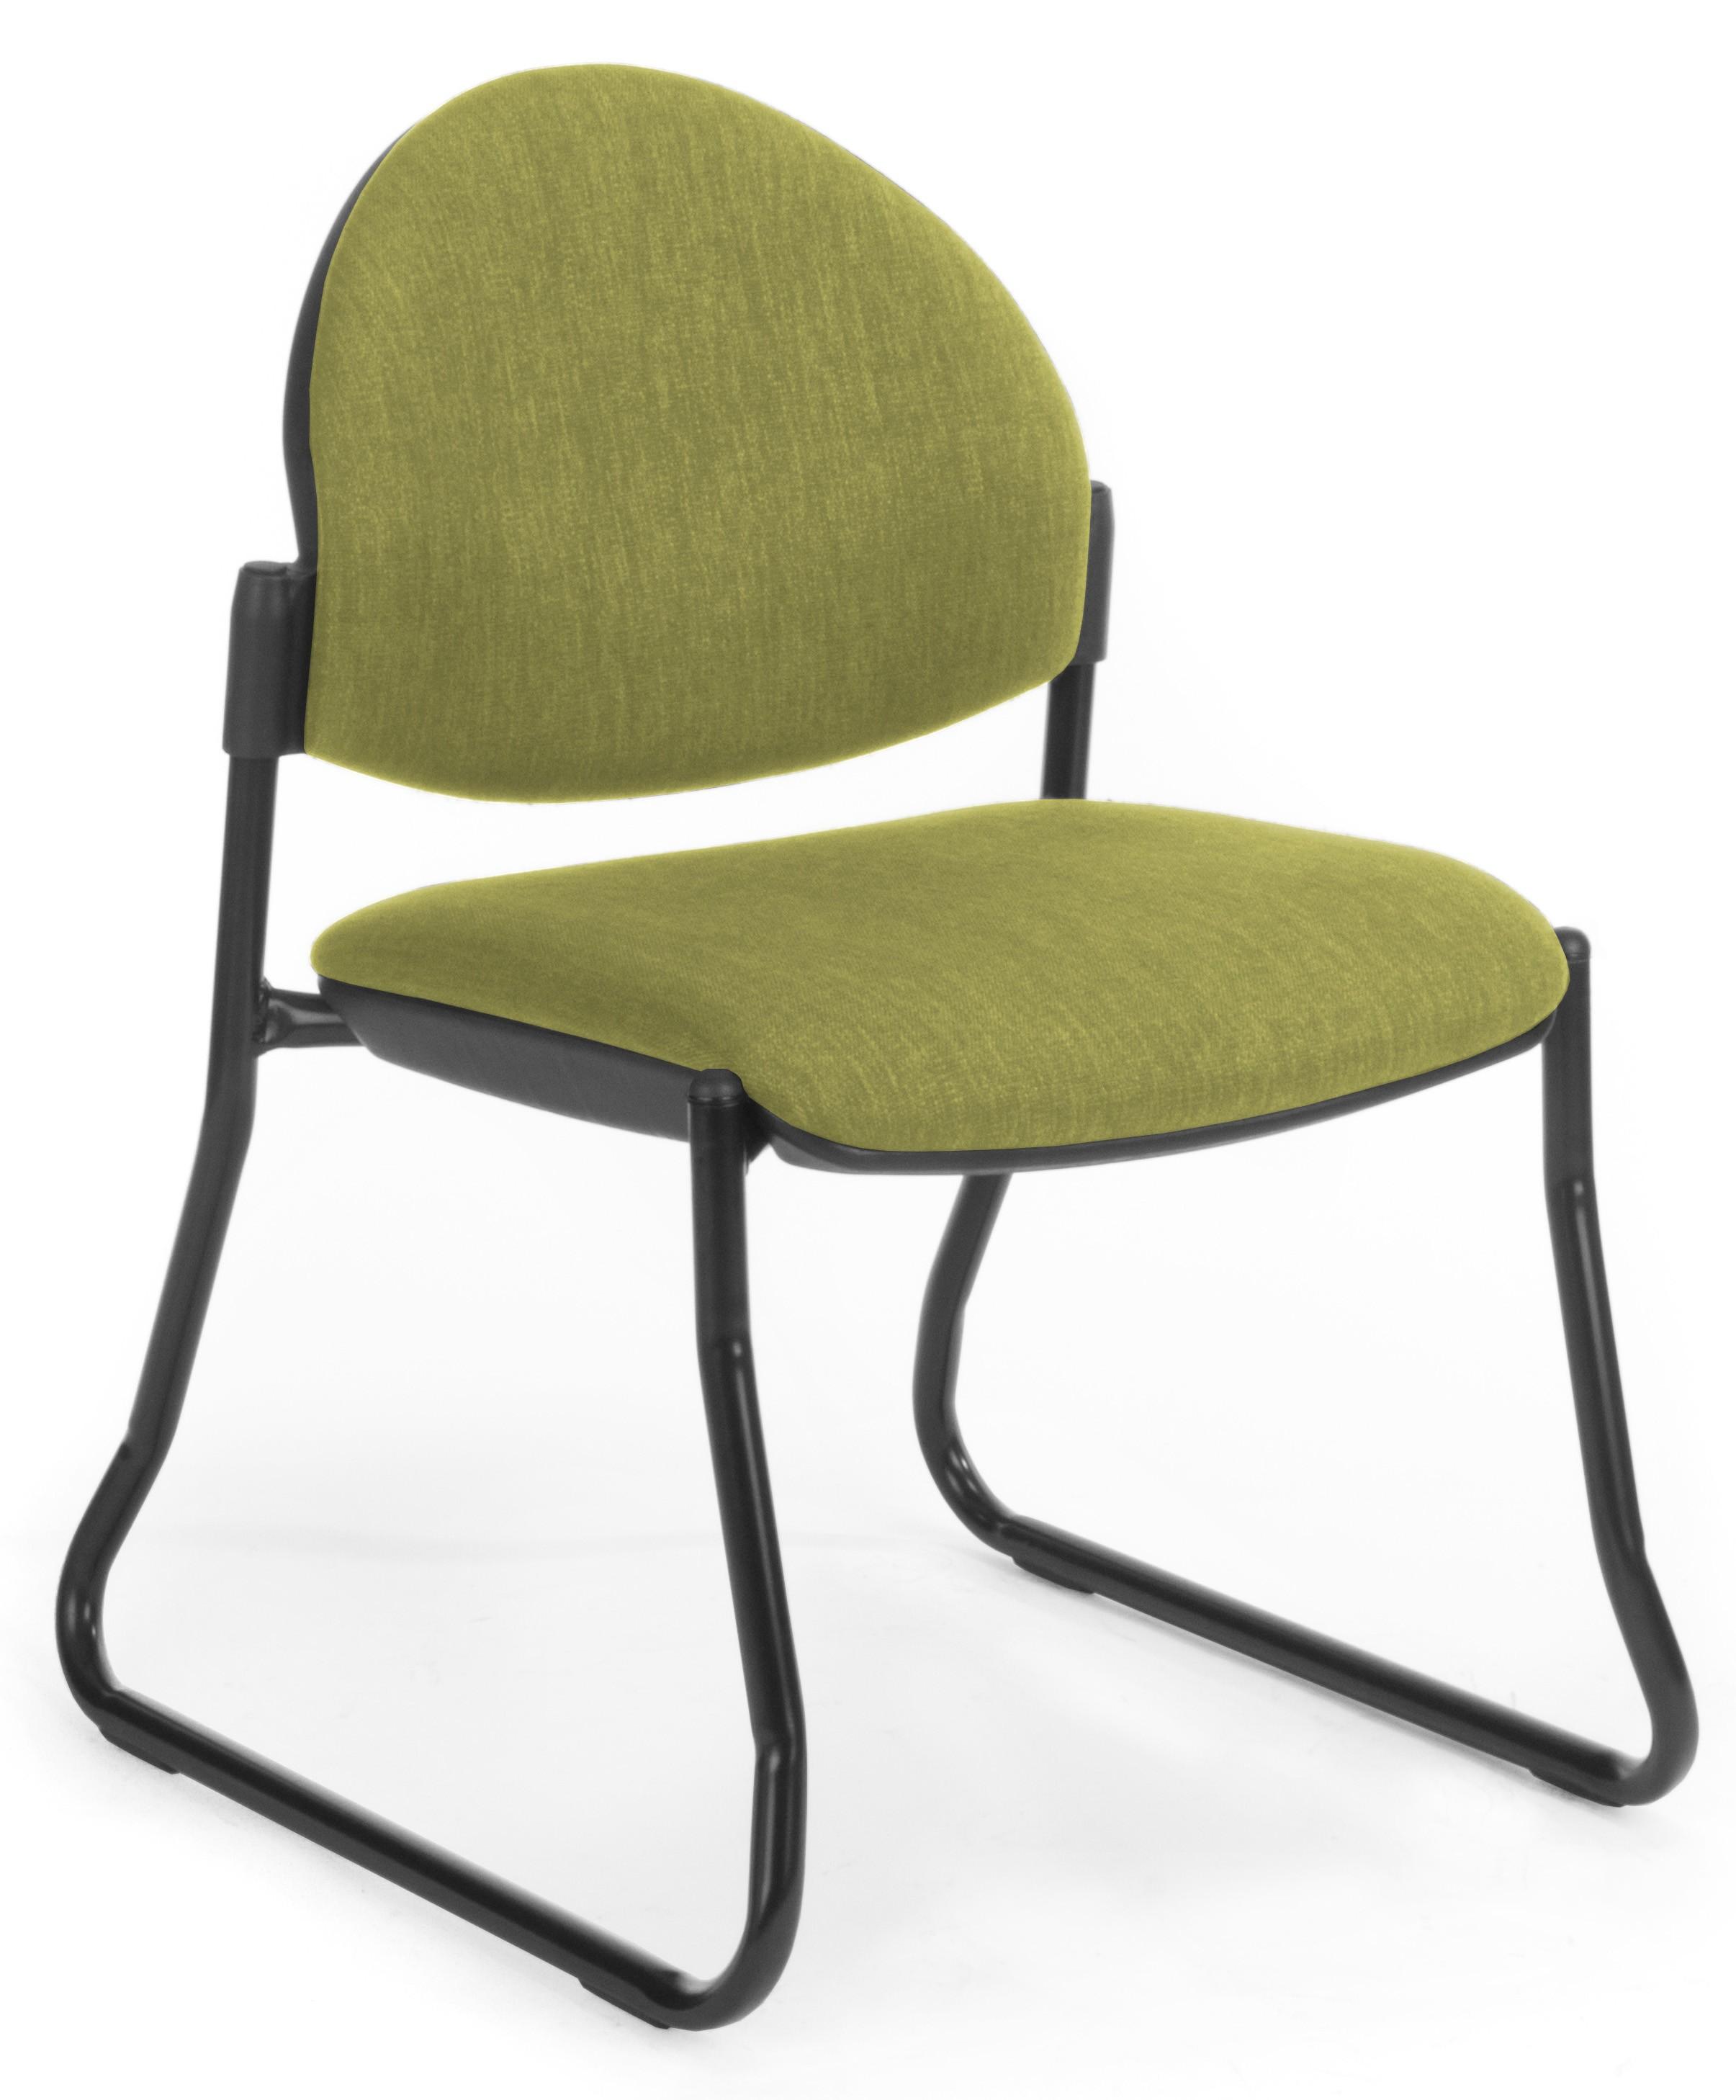 Venice Sled Black Frame Office Furniture Desk Chairs